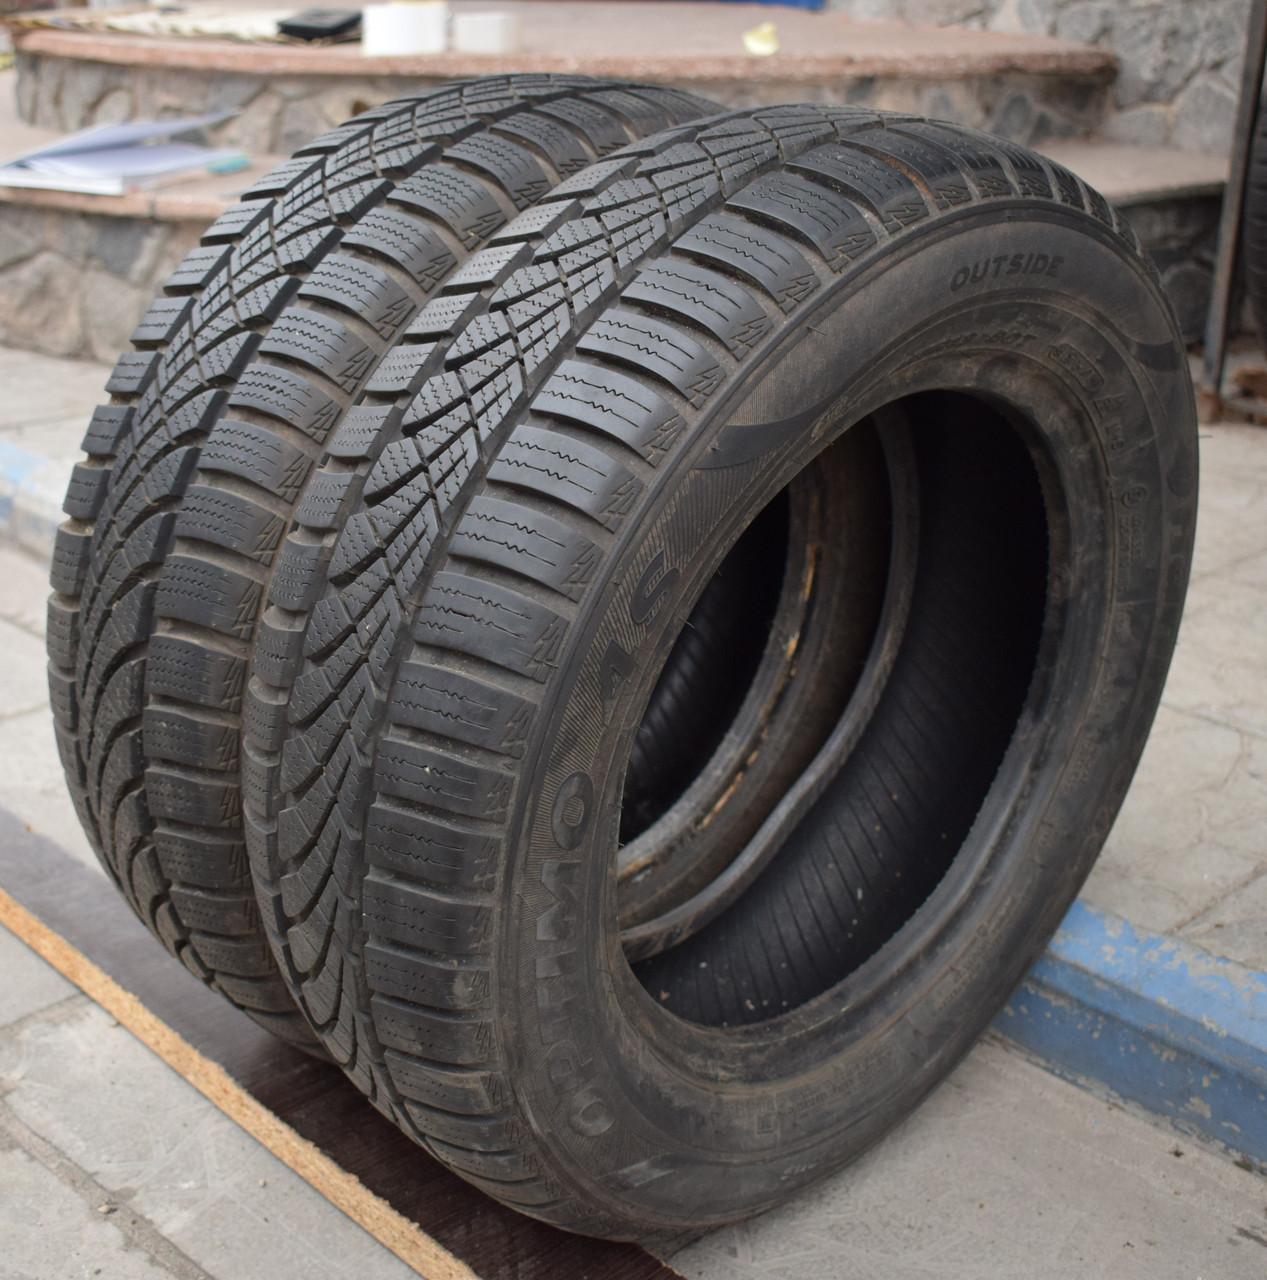 Всесезонні шини б/у 175/65 R13 Hankook Optimo, 7-8 мм, пара